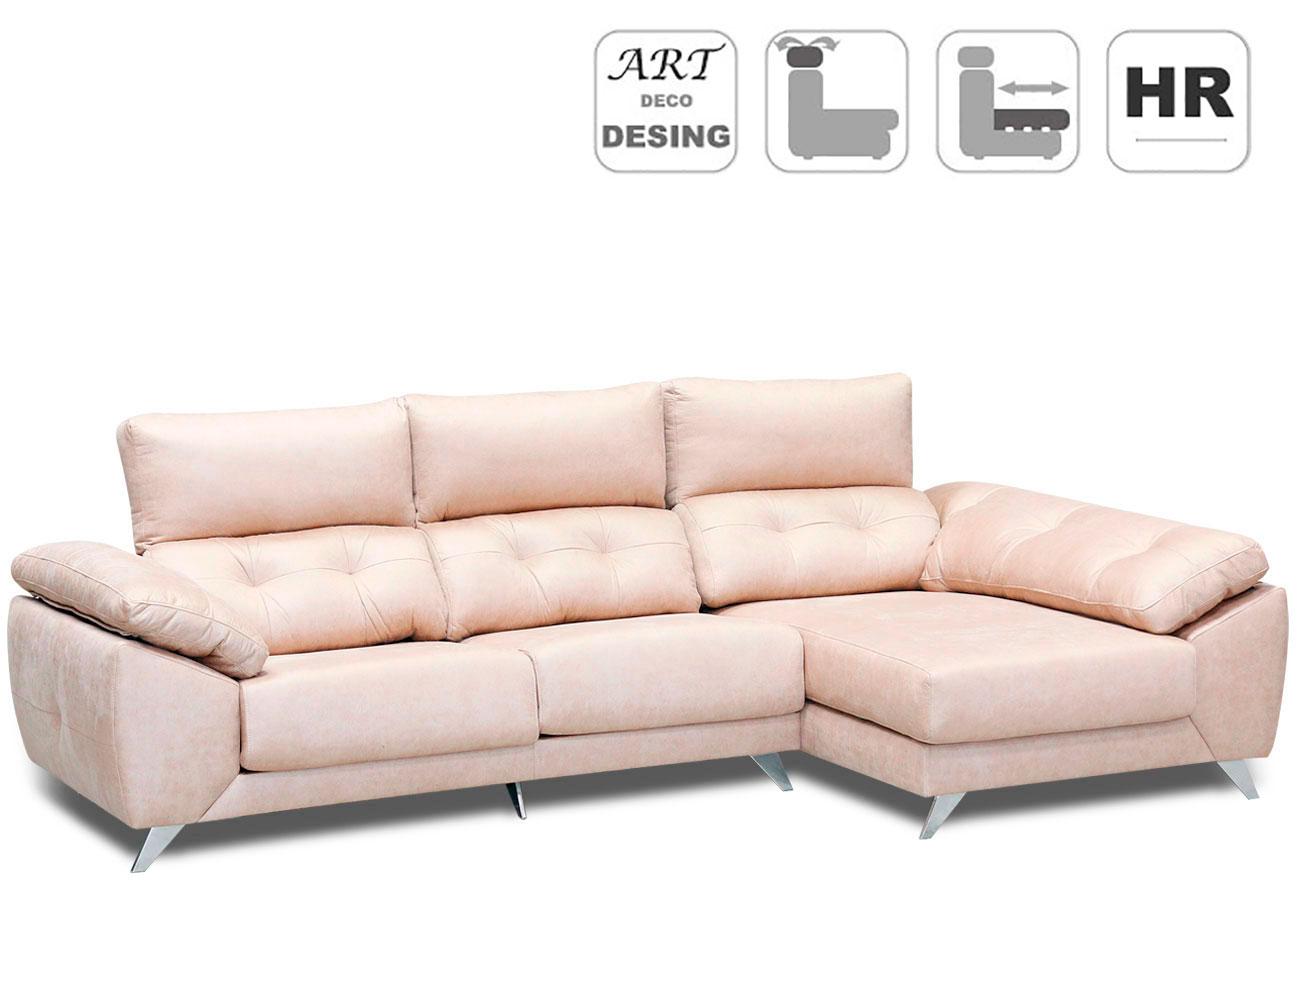 Sofa chaiselongue capitone anti machas gama alta detalle4